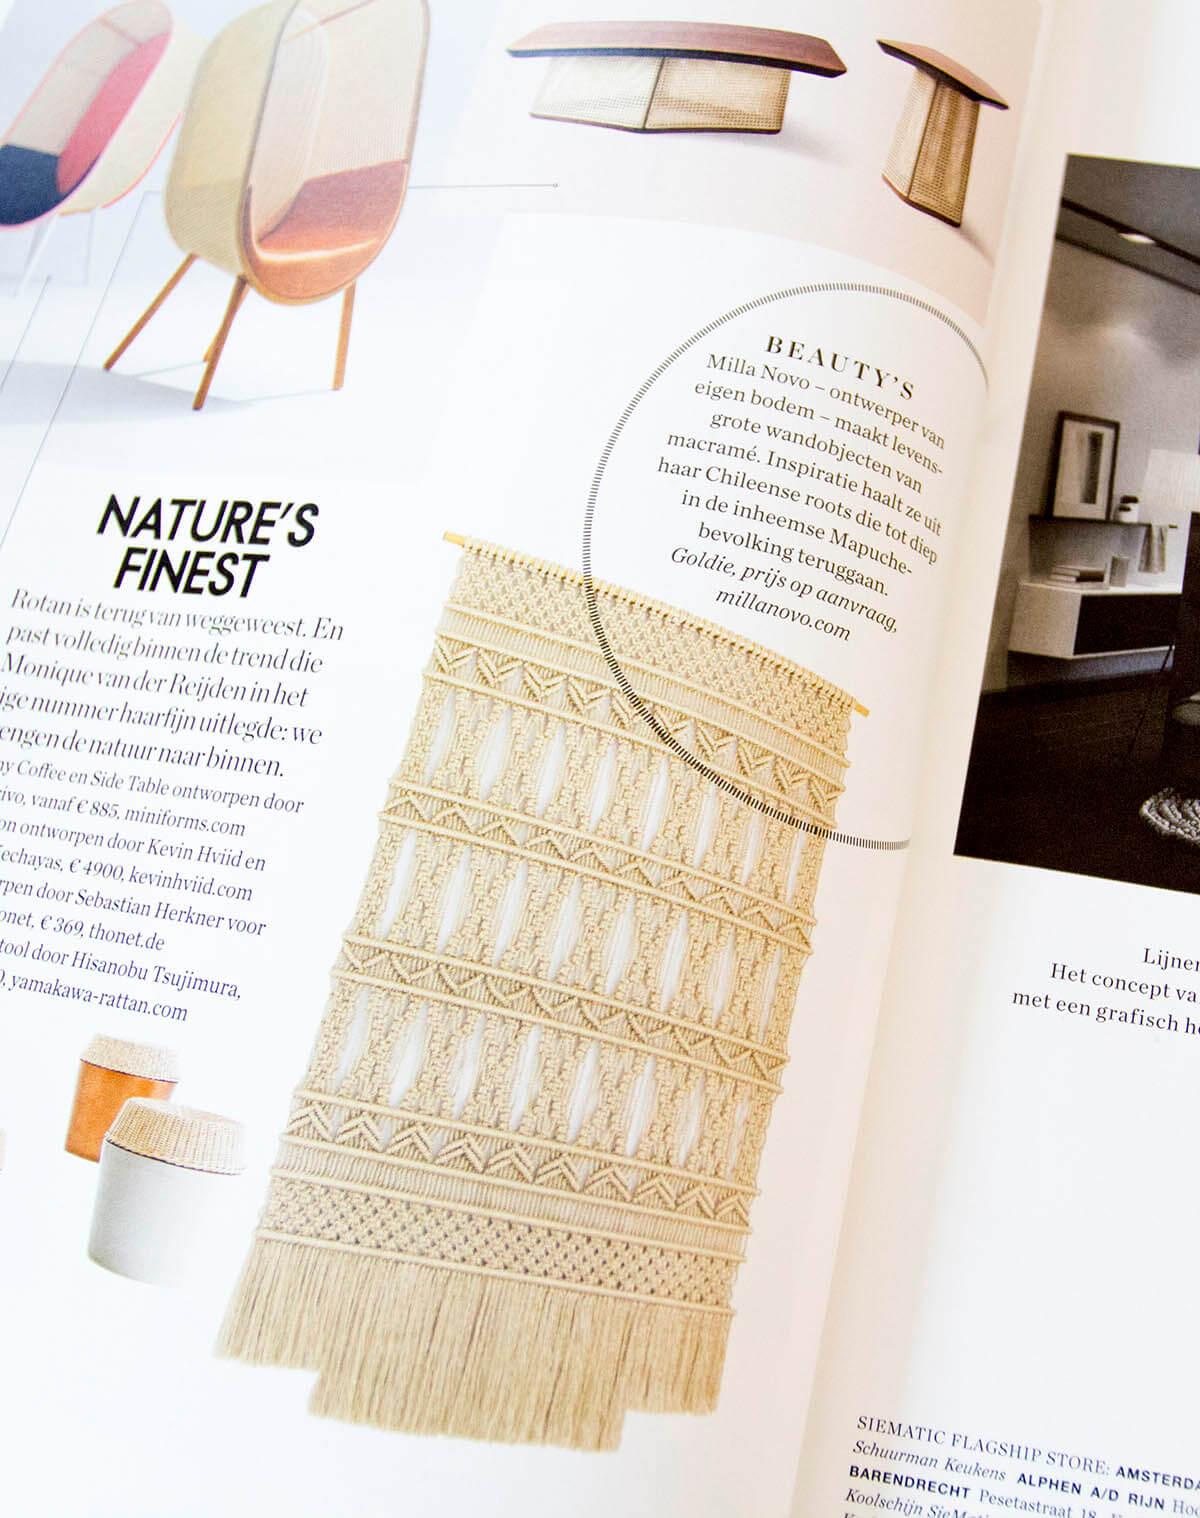 Featuring in interior lifestyle magazine Milla Novo Macrame Wallhanging